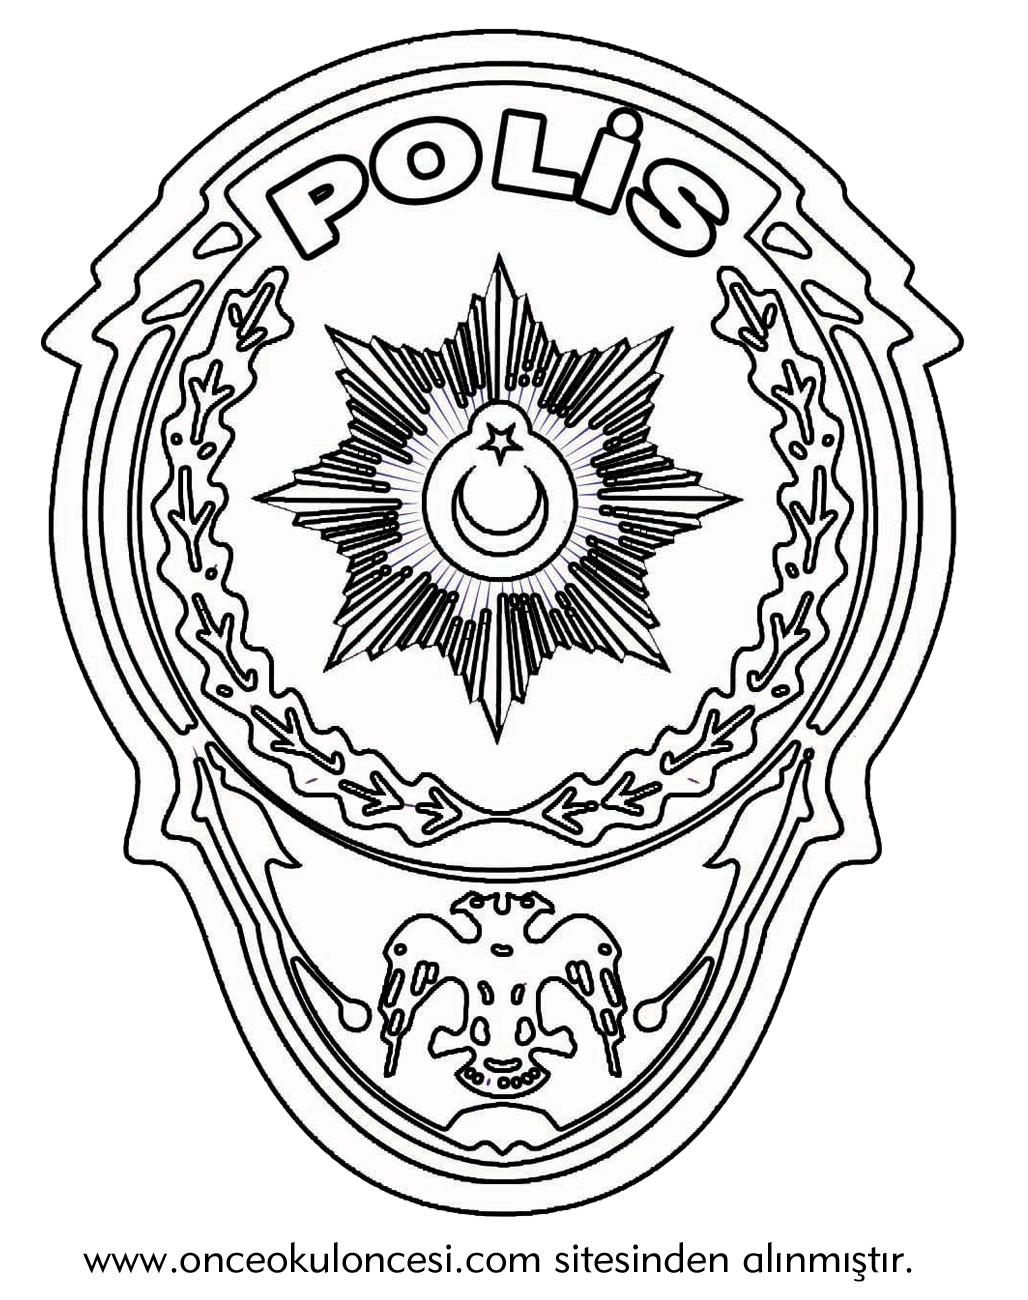 Polis Rozeti Boyama Sayfasi